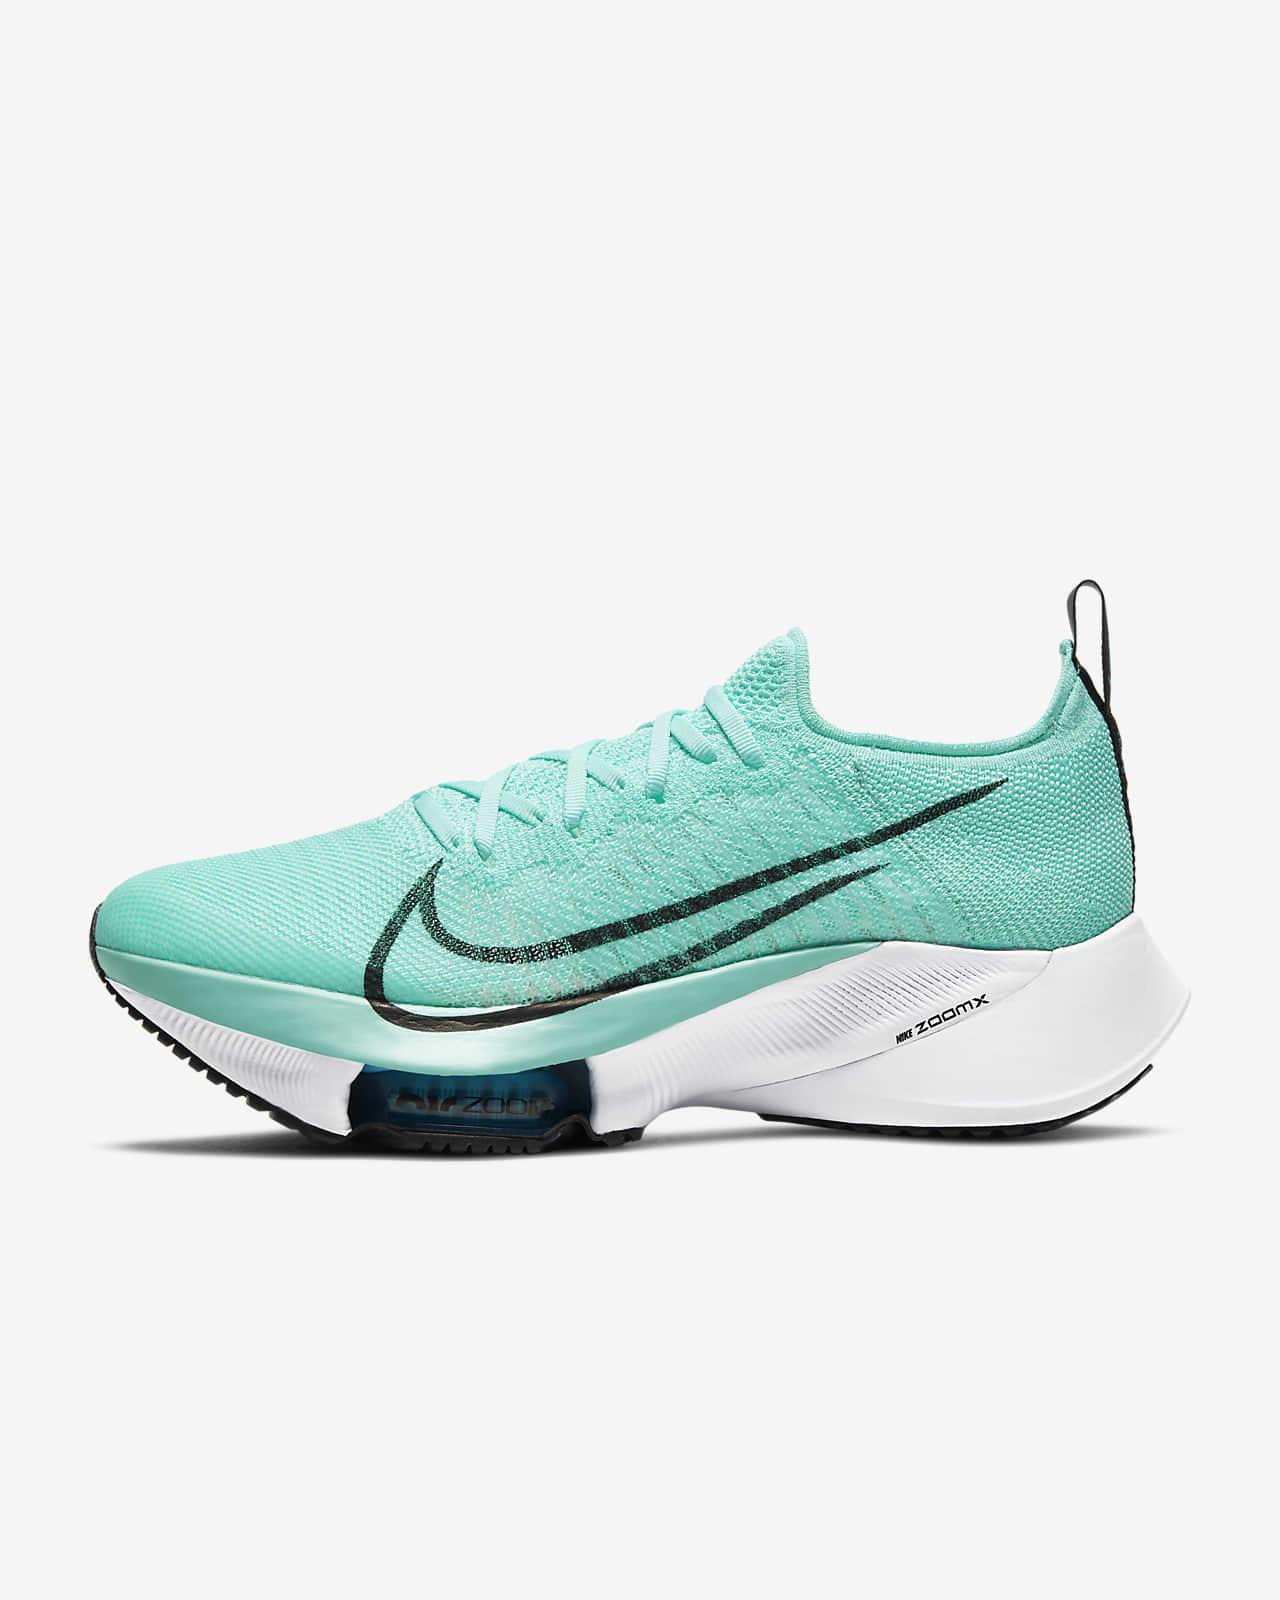 Nike Air Zoom Tempo NEXT% Women's Running Shoe. Nike LU